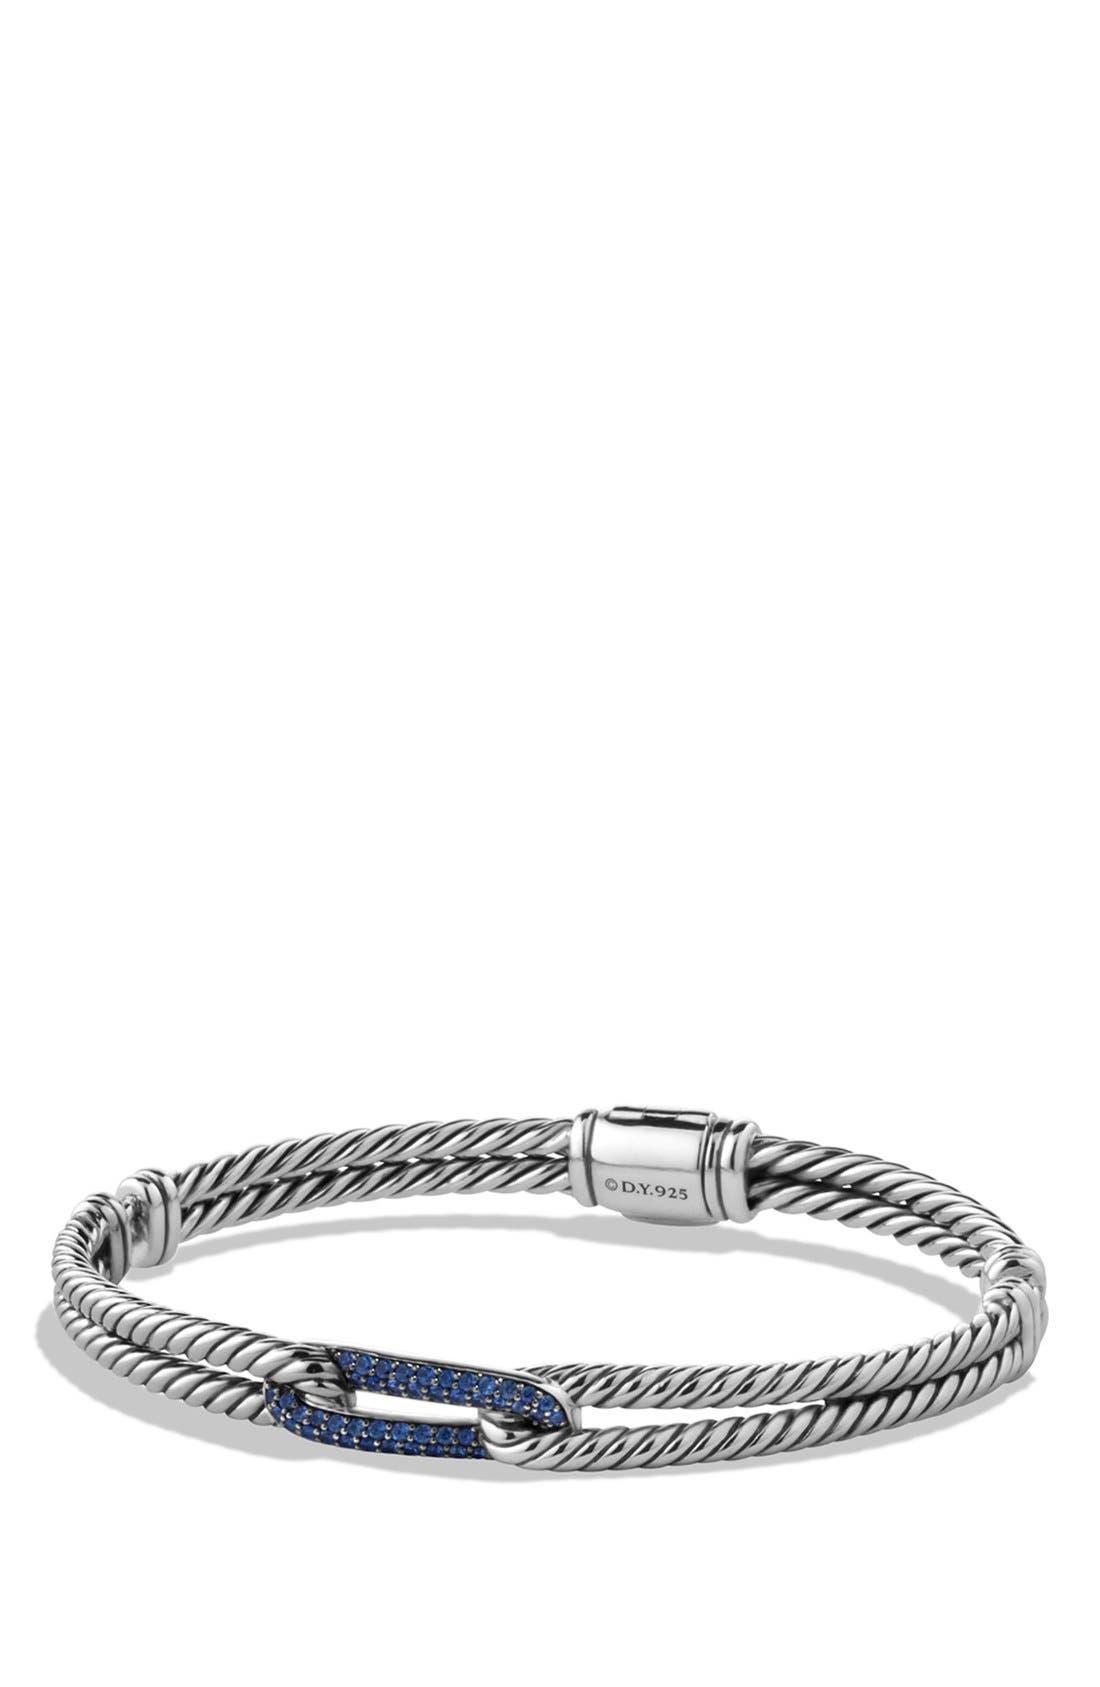 Alternate Image 1 Selected - David Yurman 'Labyrinth' Petite Pavé Single-Loop Bracelet with Sapphires